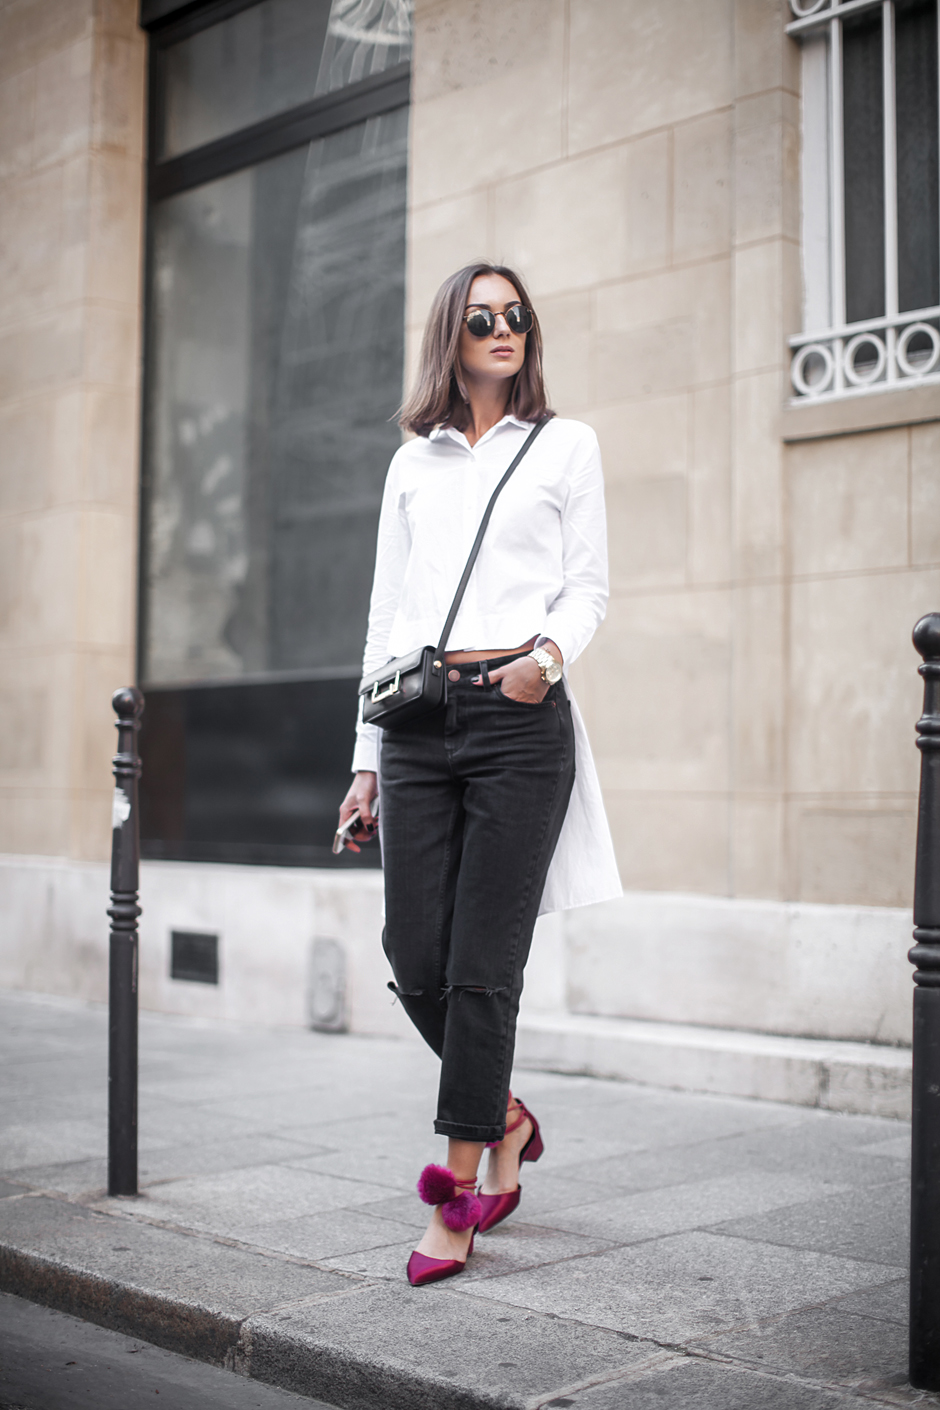 pom-pom-heels-sandals-outfit-black